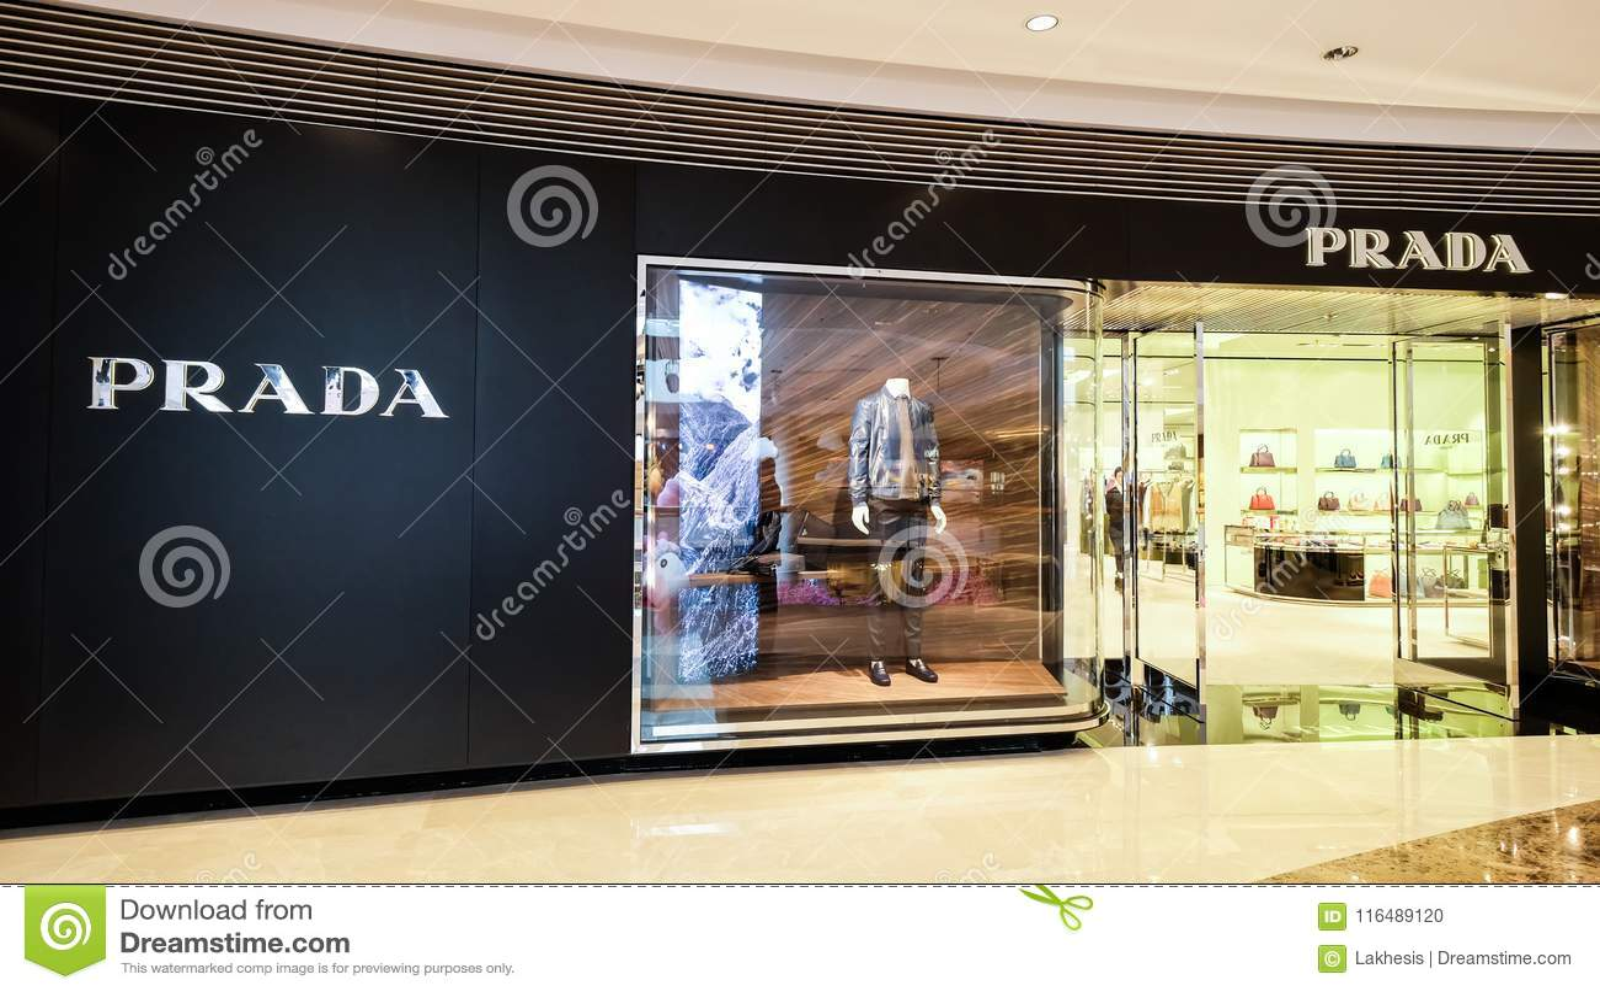 half off 513b7 2554a Prada Adatta La Vetrina Del Boutique Hon Kong Immagine ...